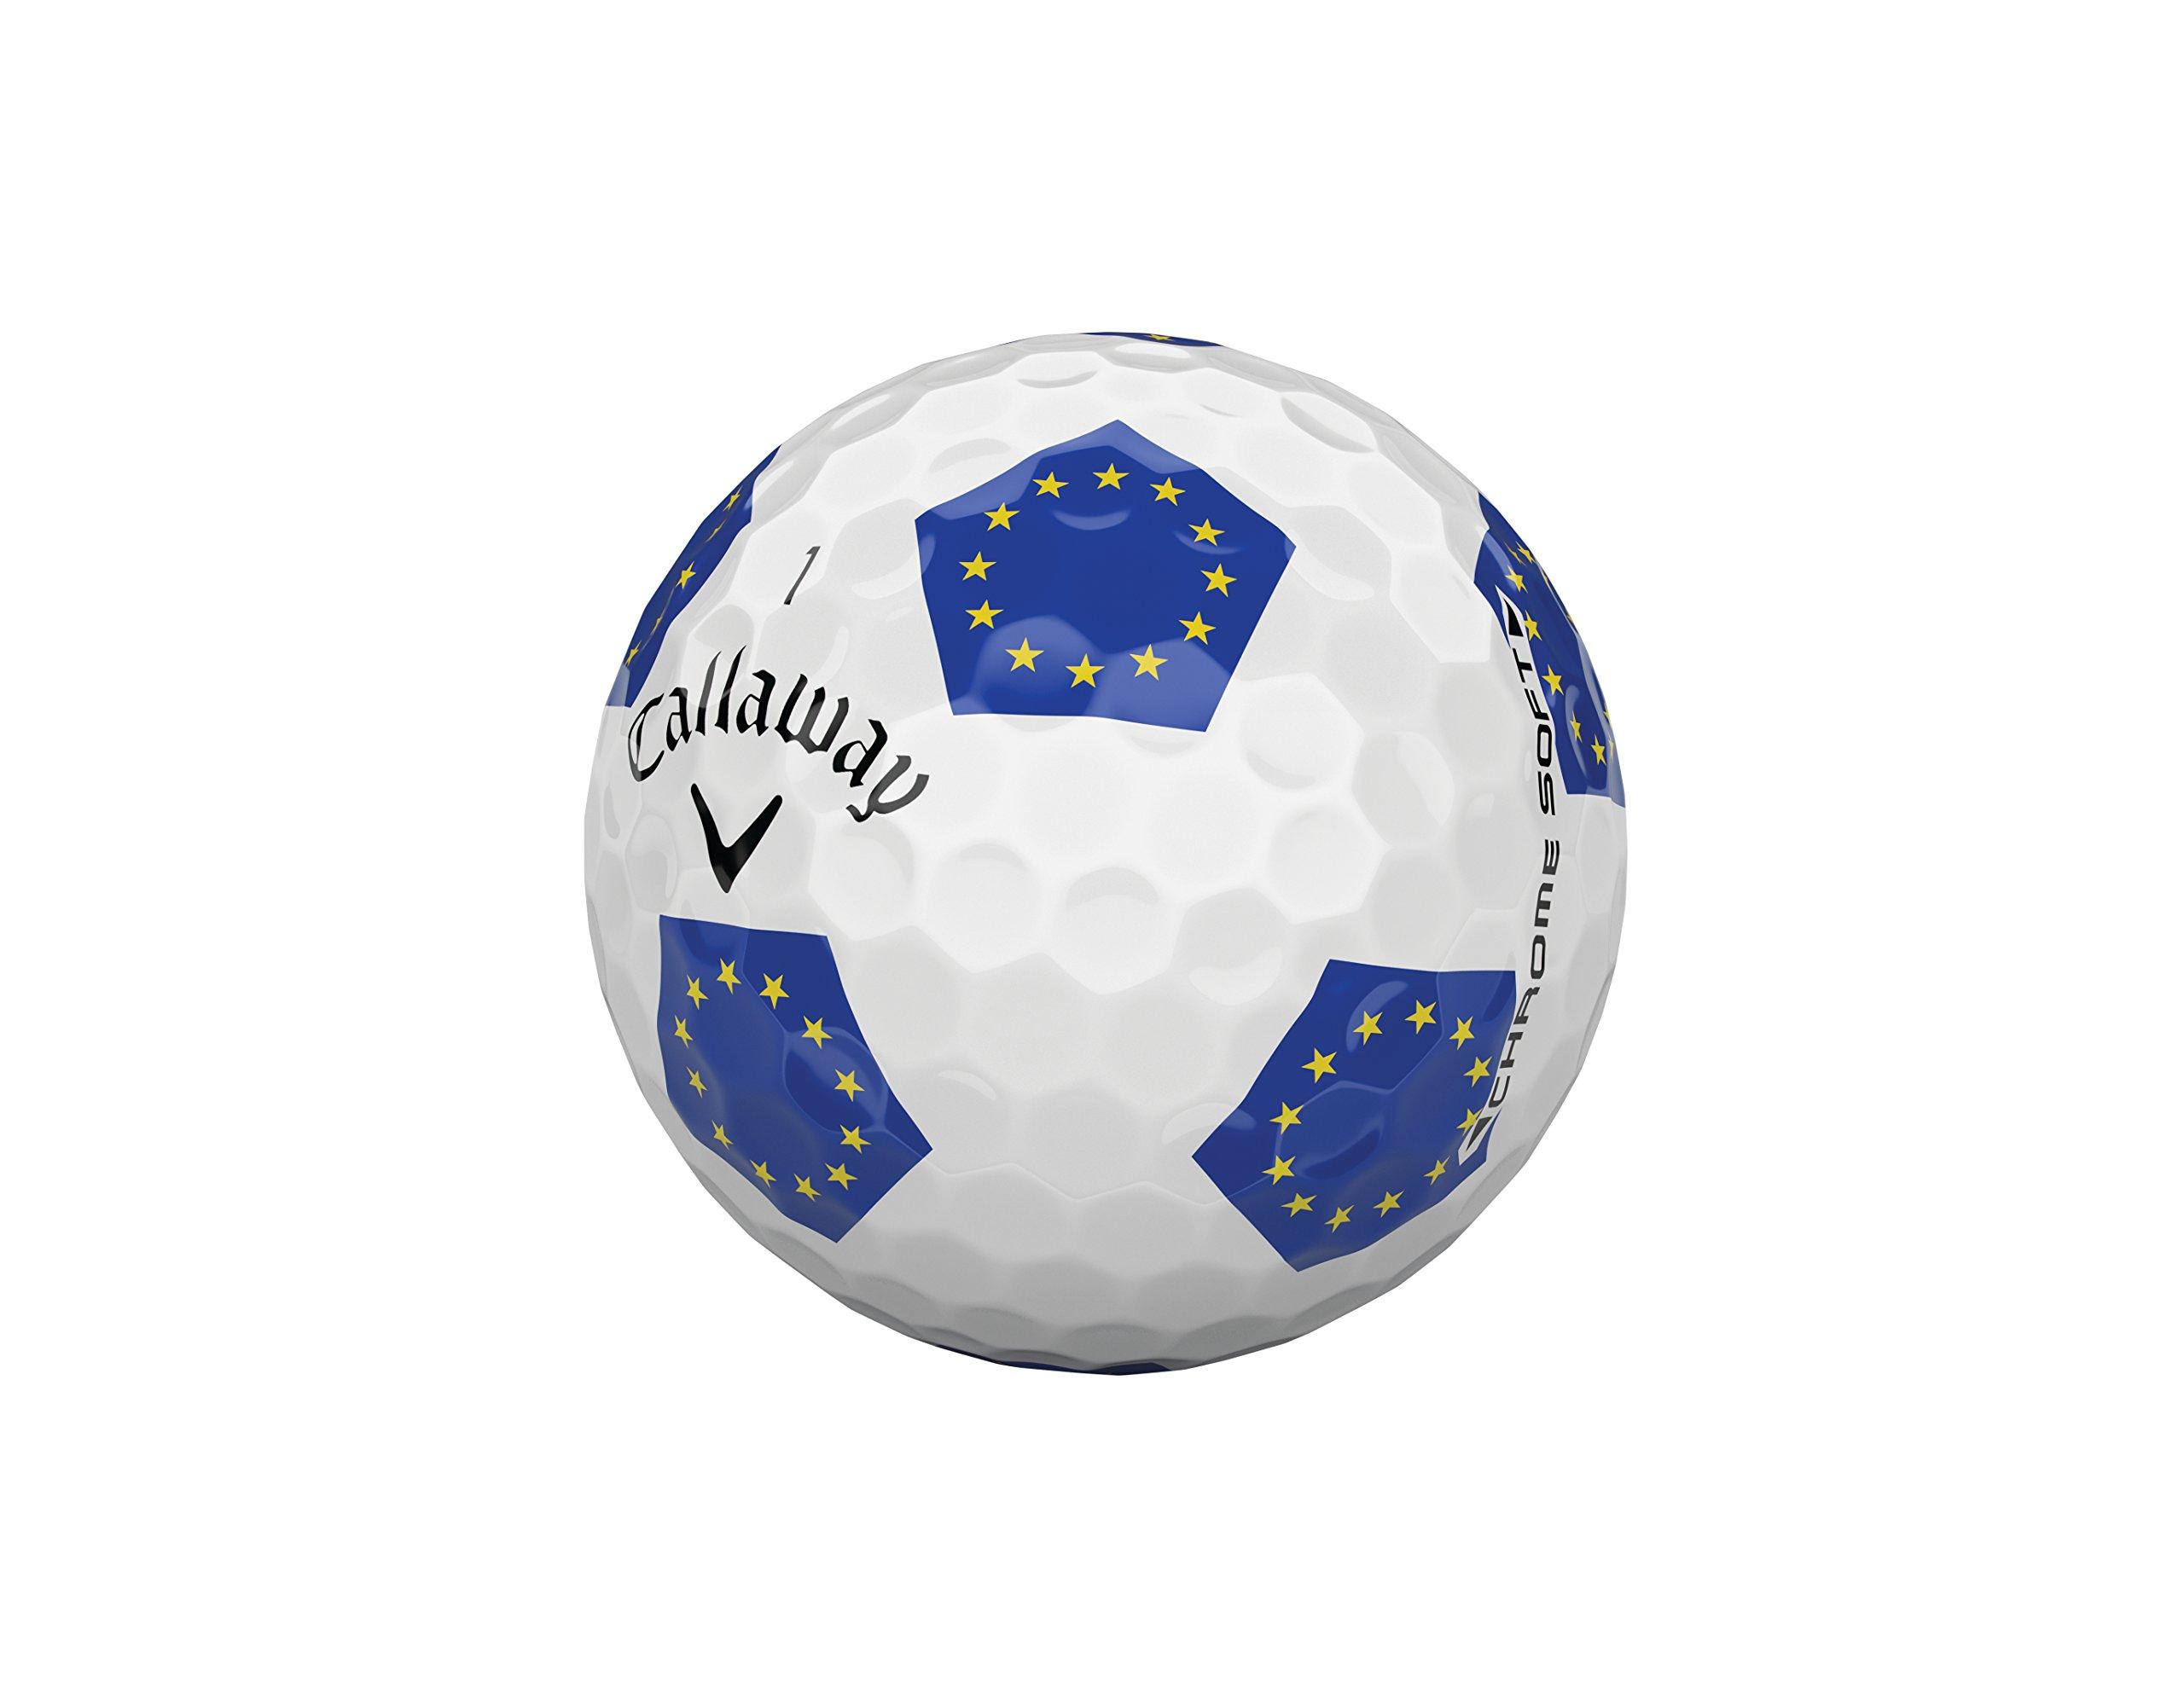 Callaway Golf One Dozen Chrome Soft 18 European Union Truvis Golf Ball by Callaway